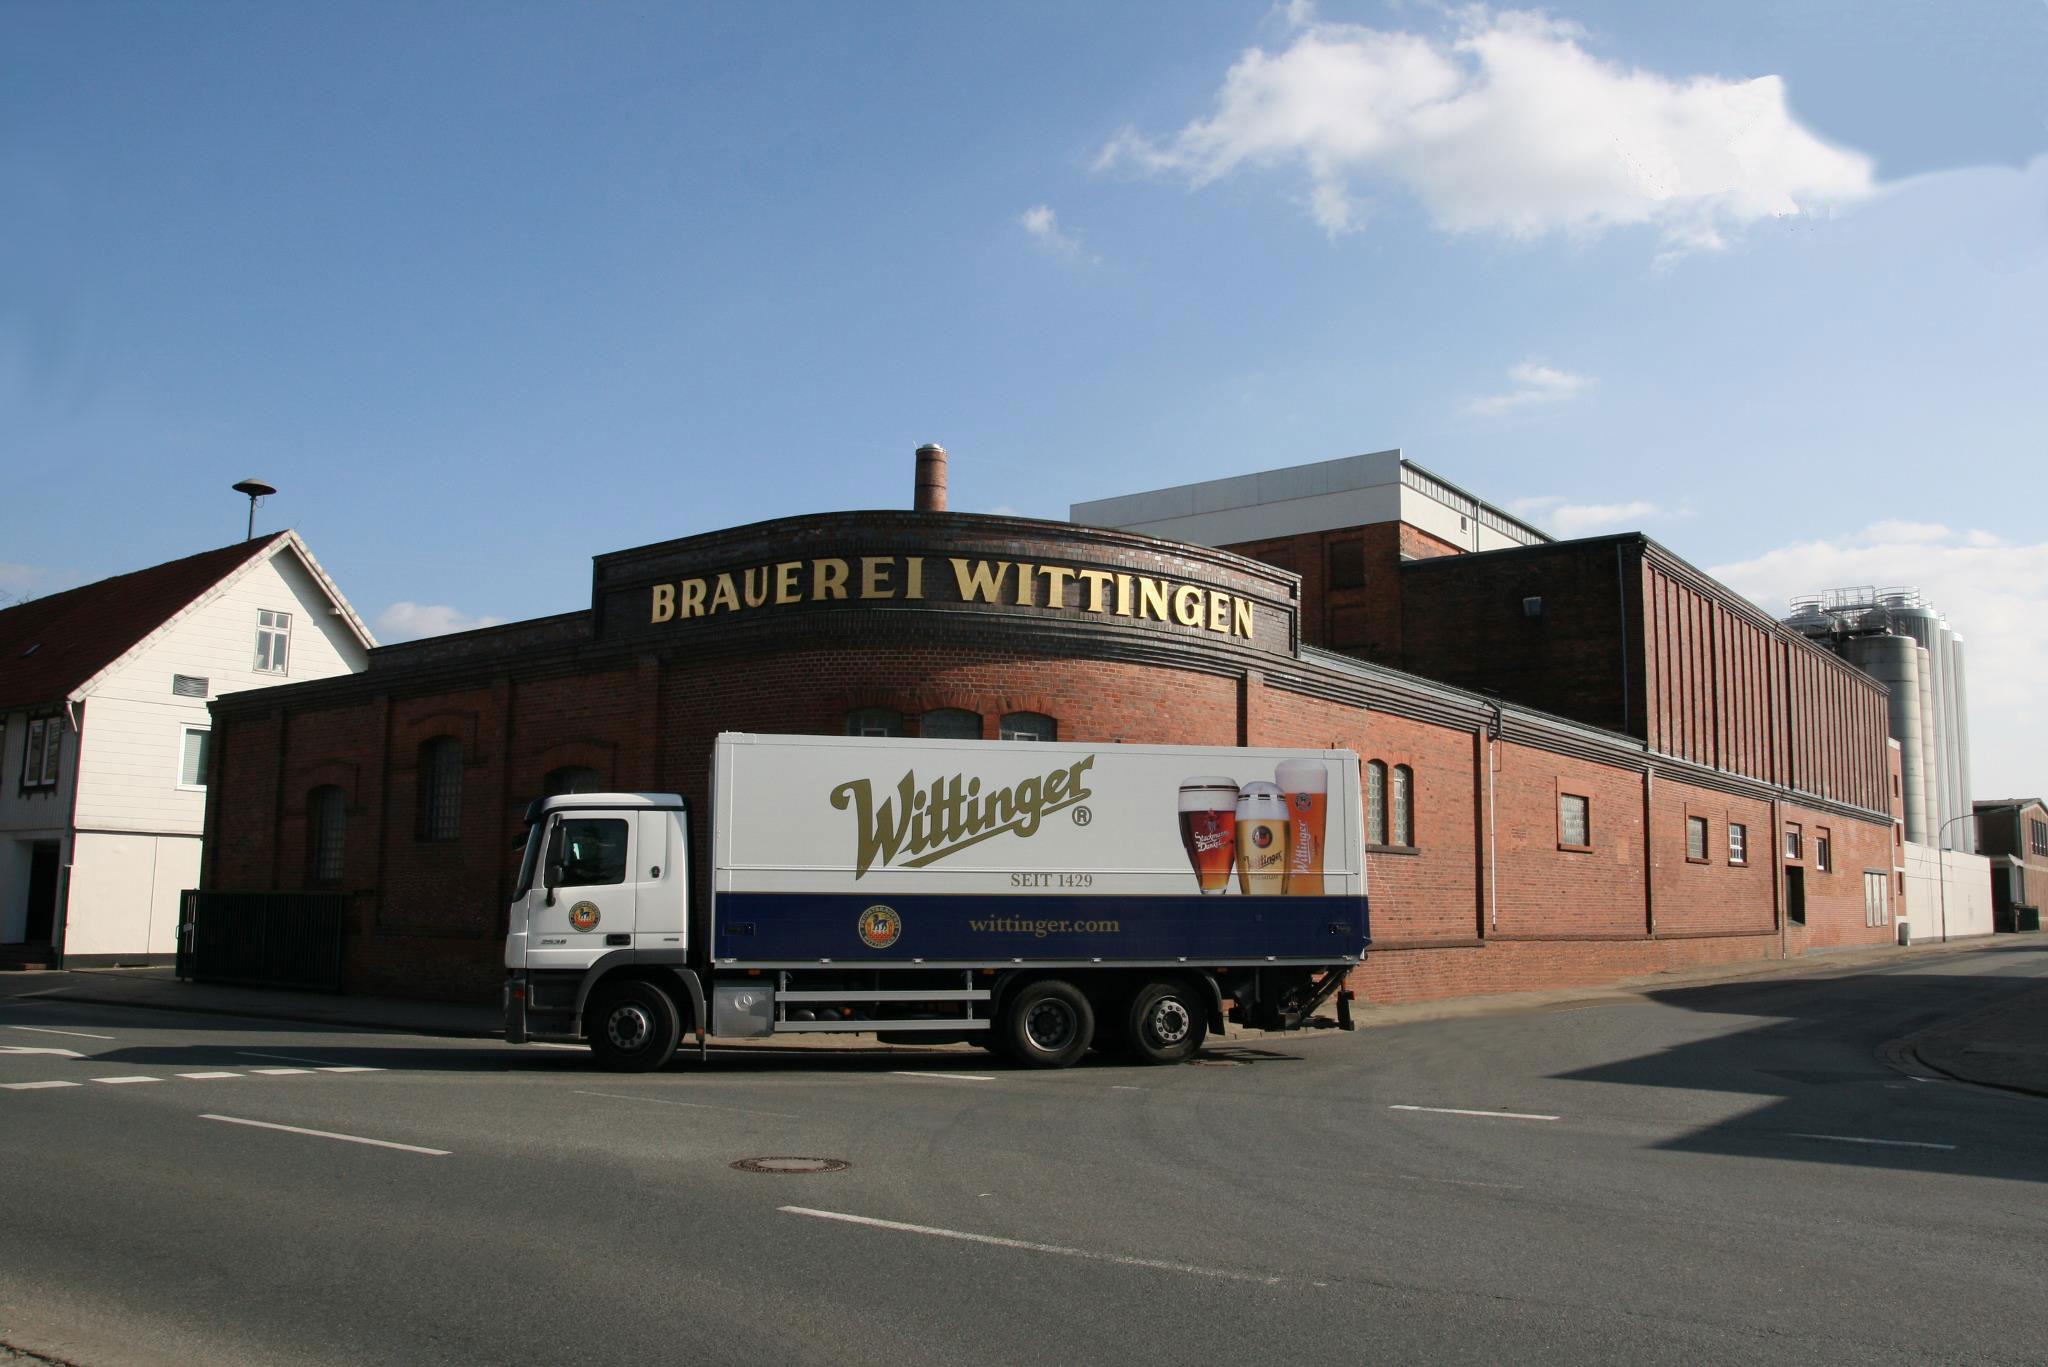 Brauerei Wittingen